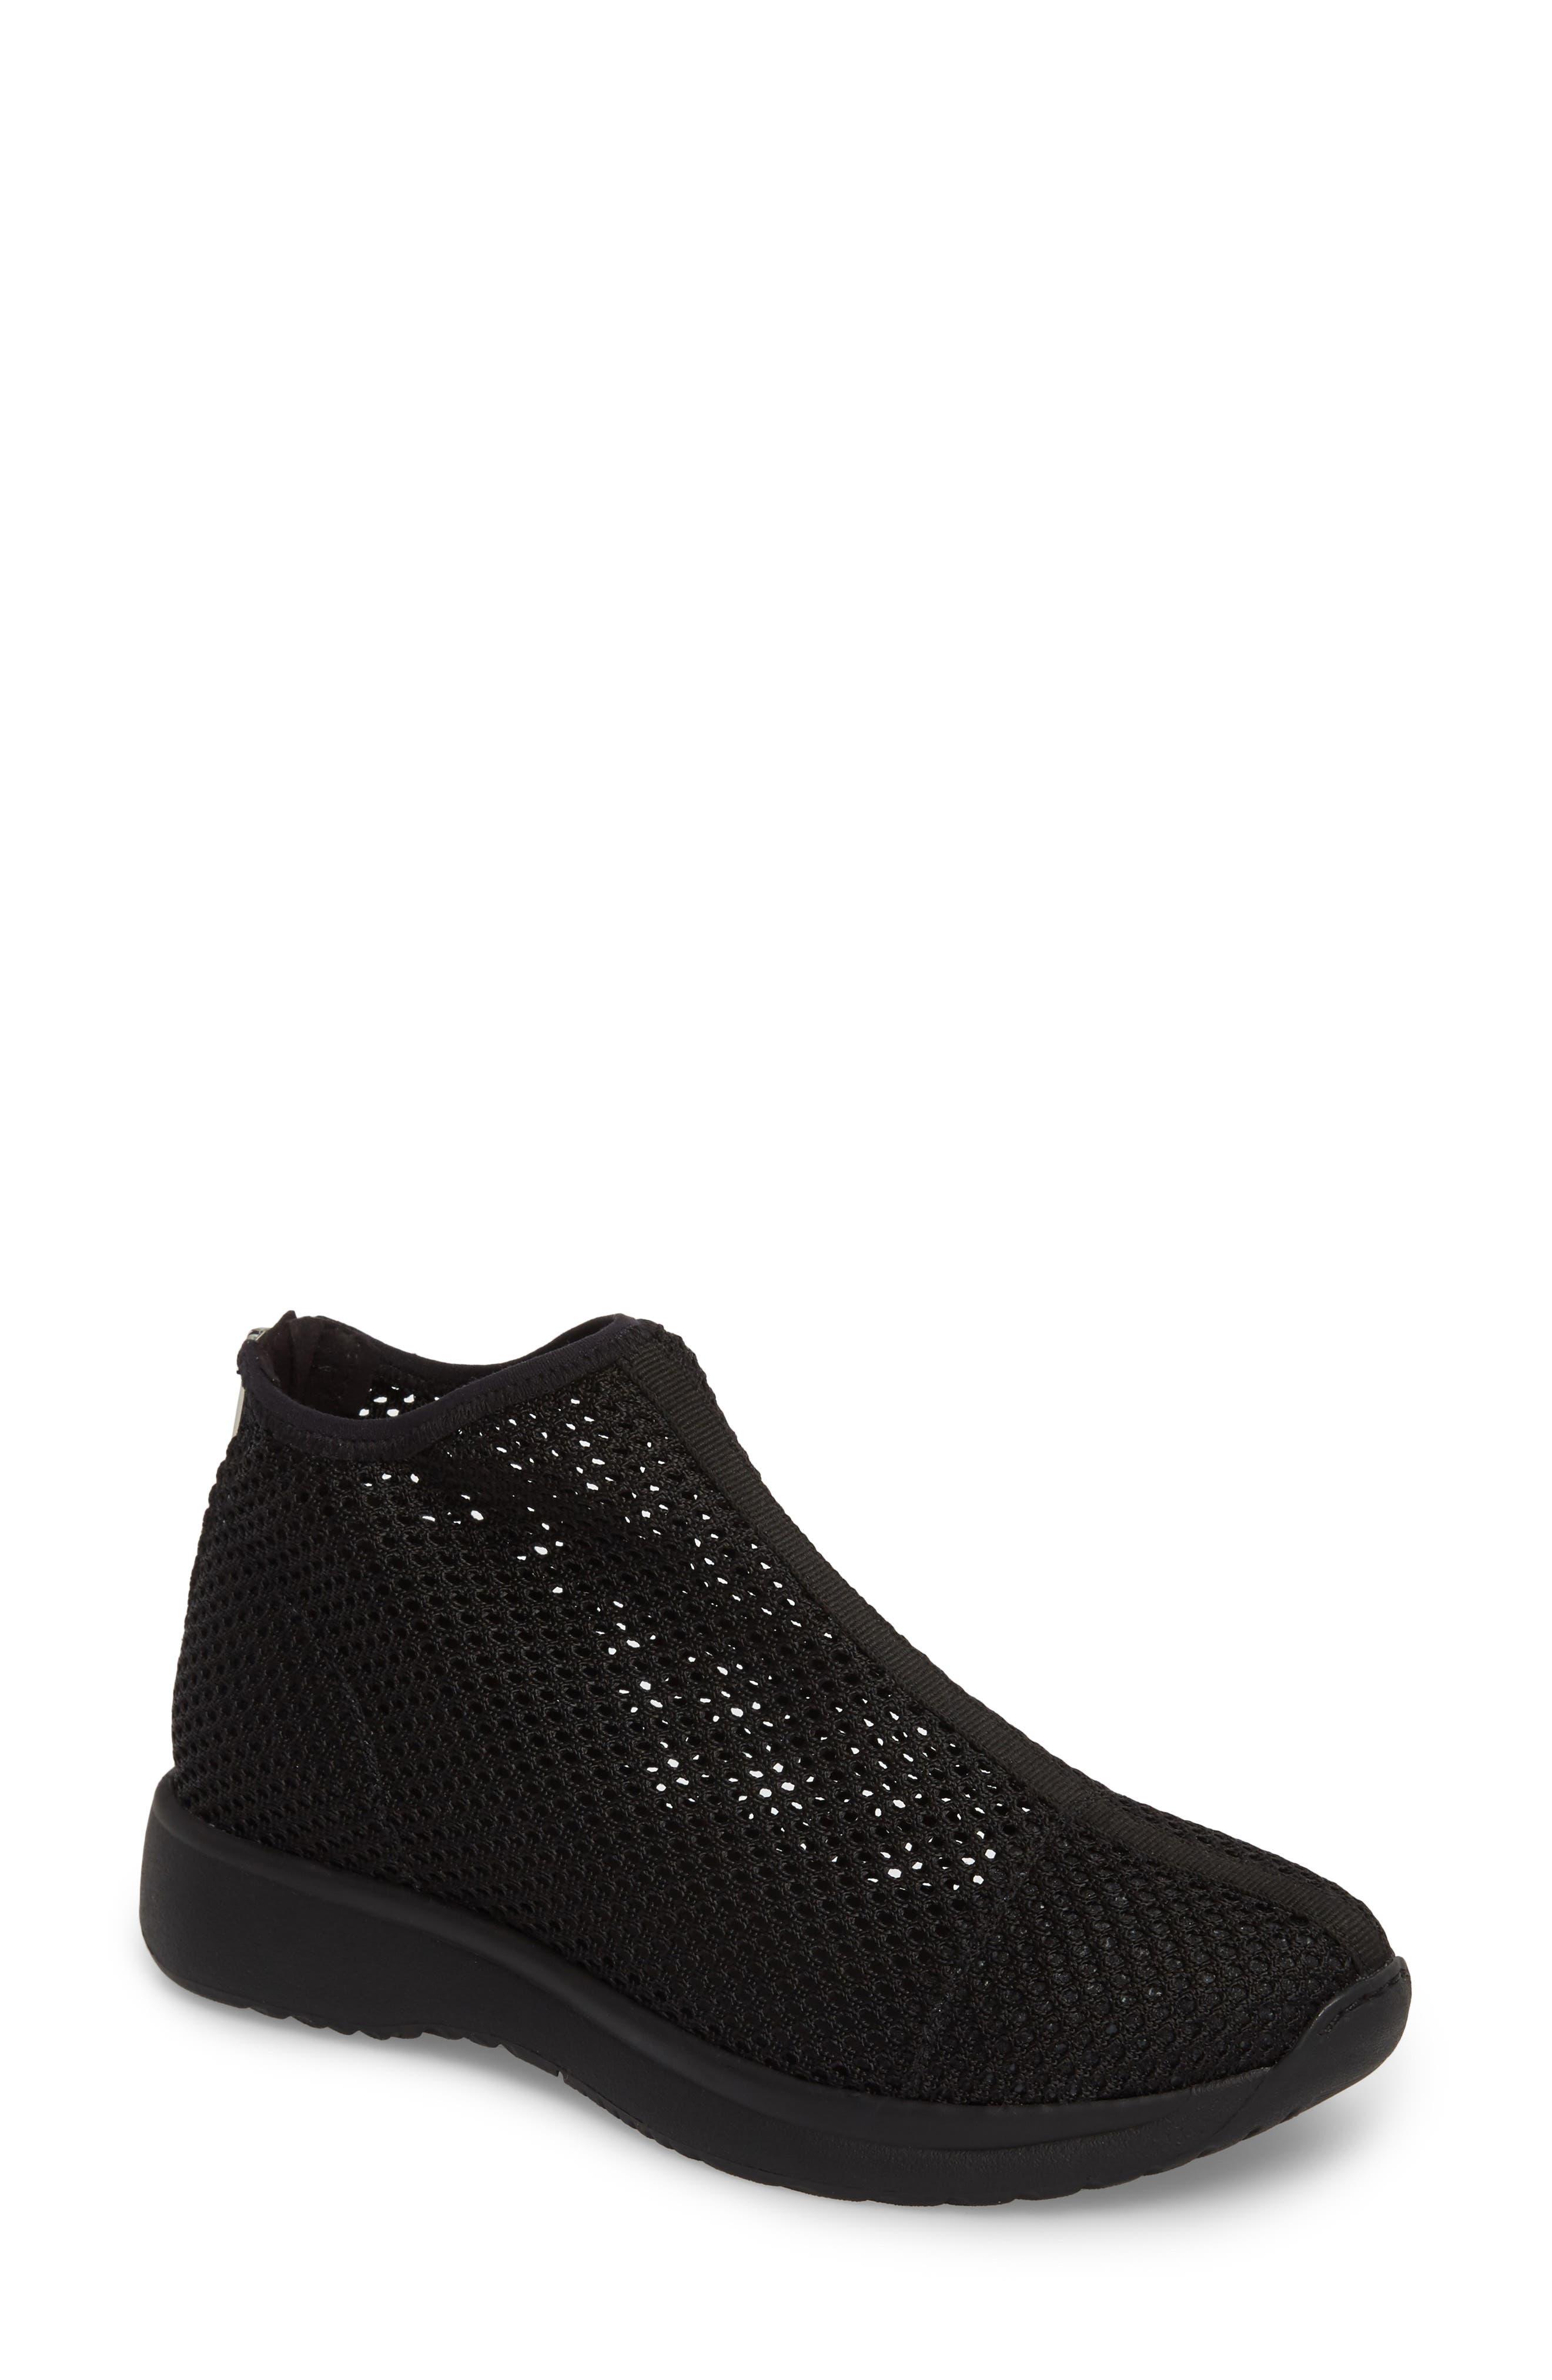 Cintia Sneaker,                         Main,                         color, BLACK FABRIC